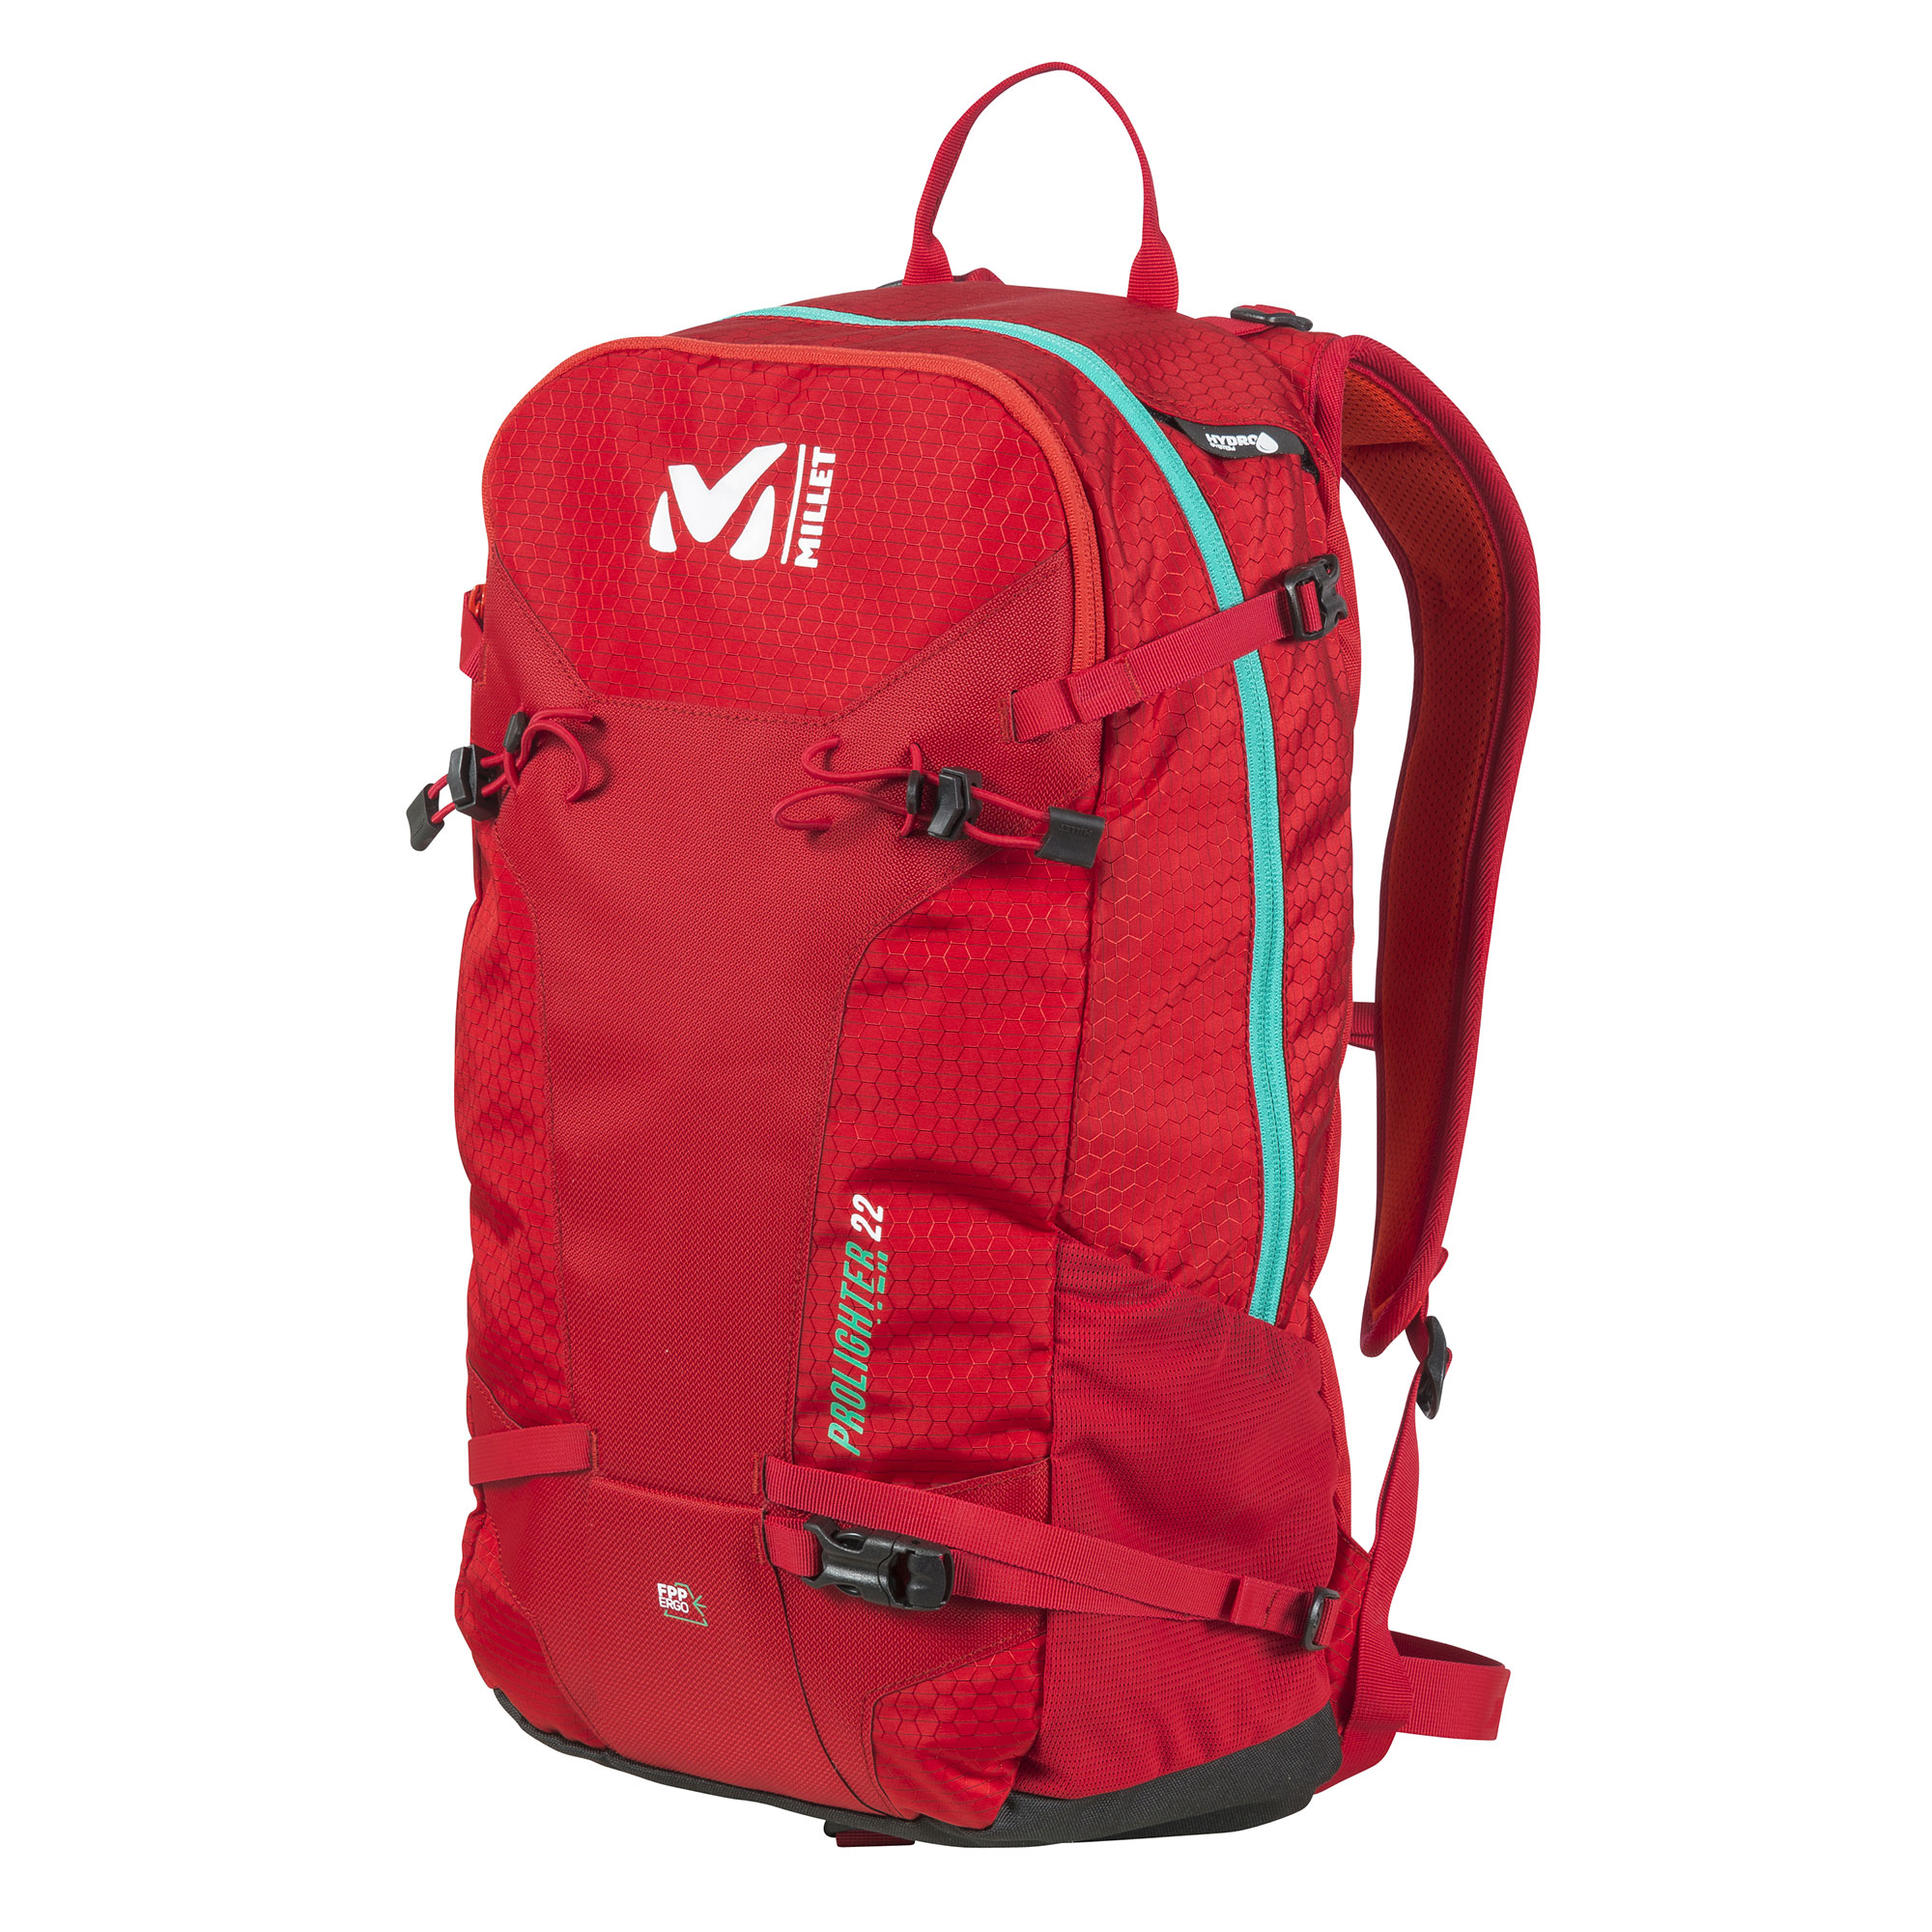 7264e02e1e271 Plecak Millet PROLIGHTER 22 , Plecaki wspinaczkowe - Cetus - sklep ...